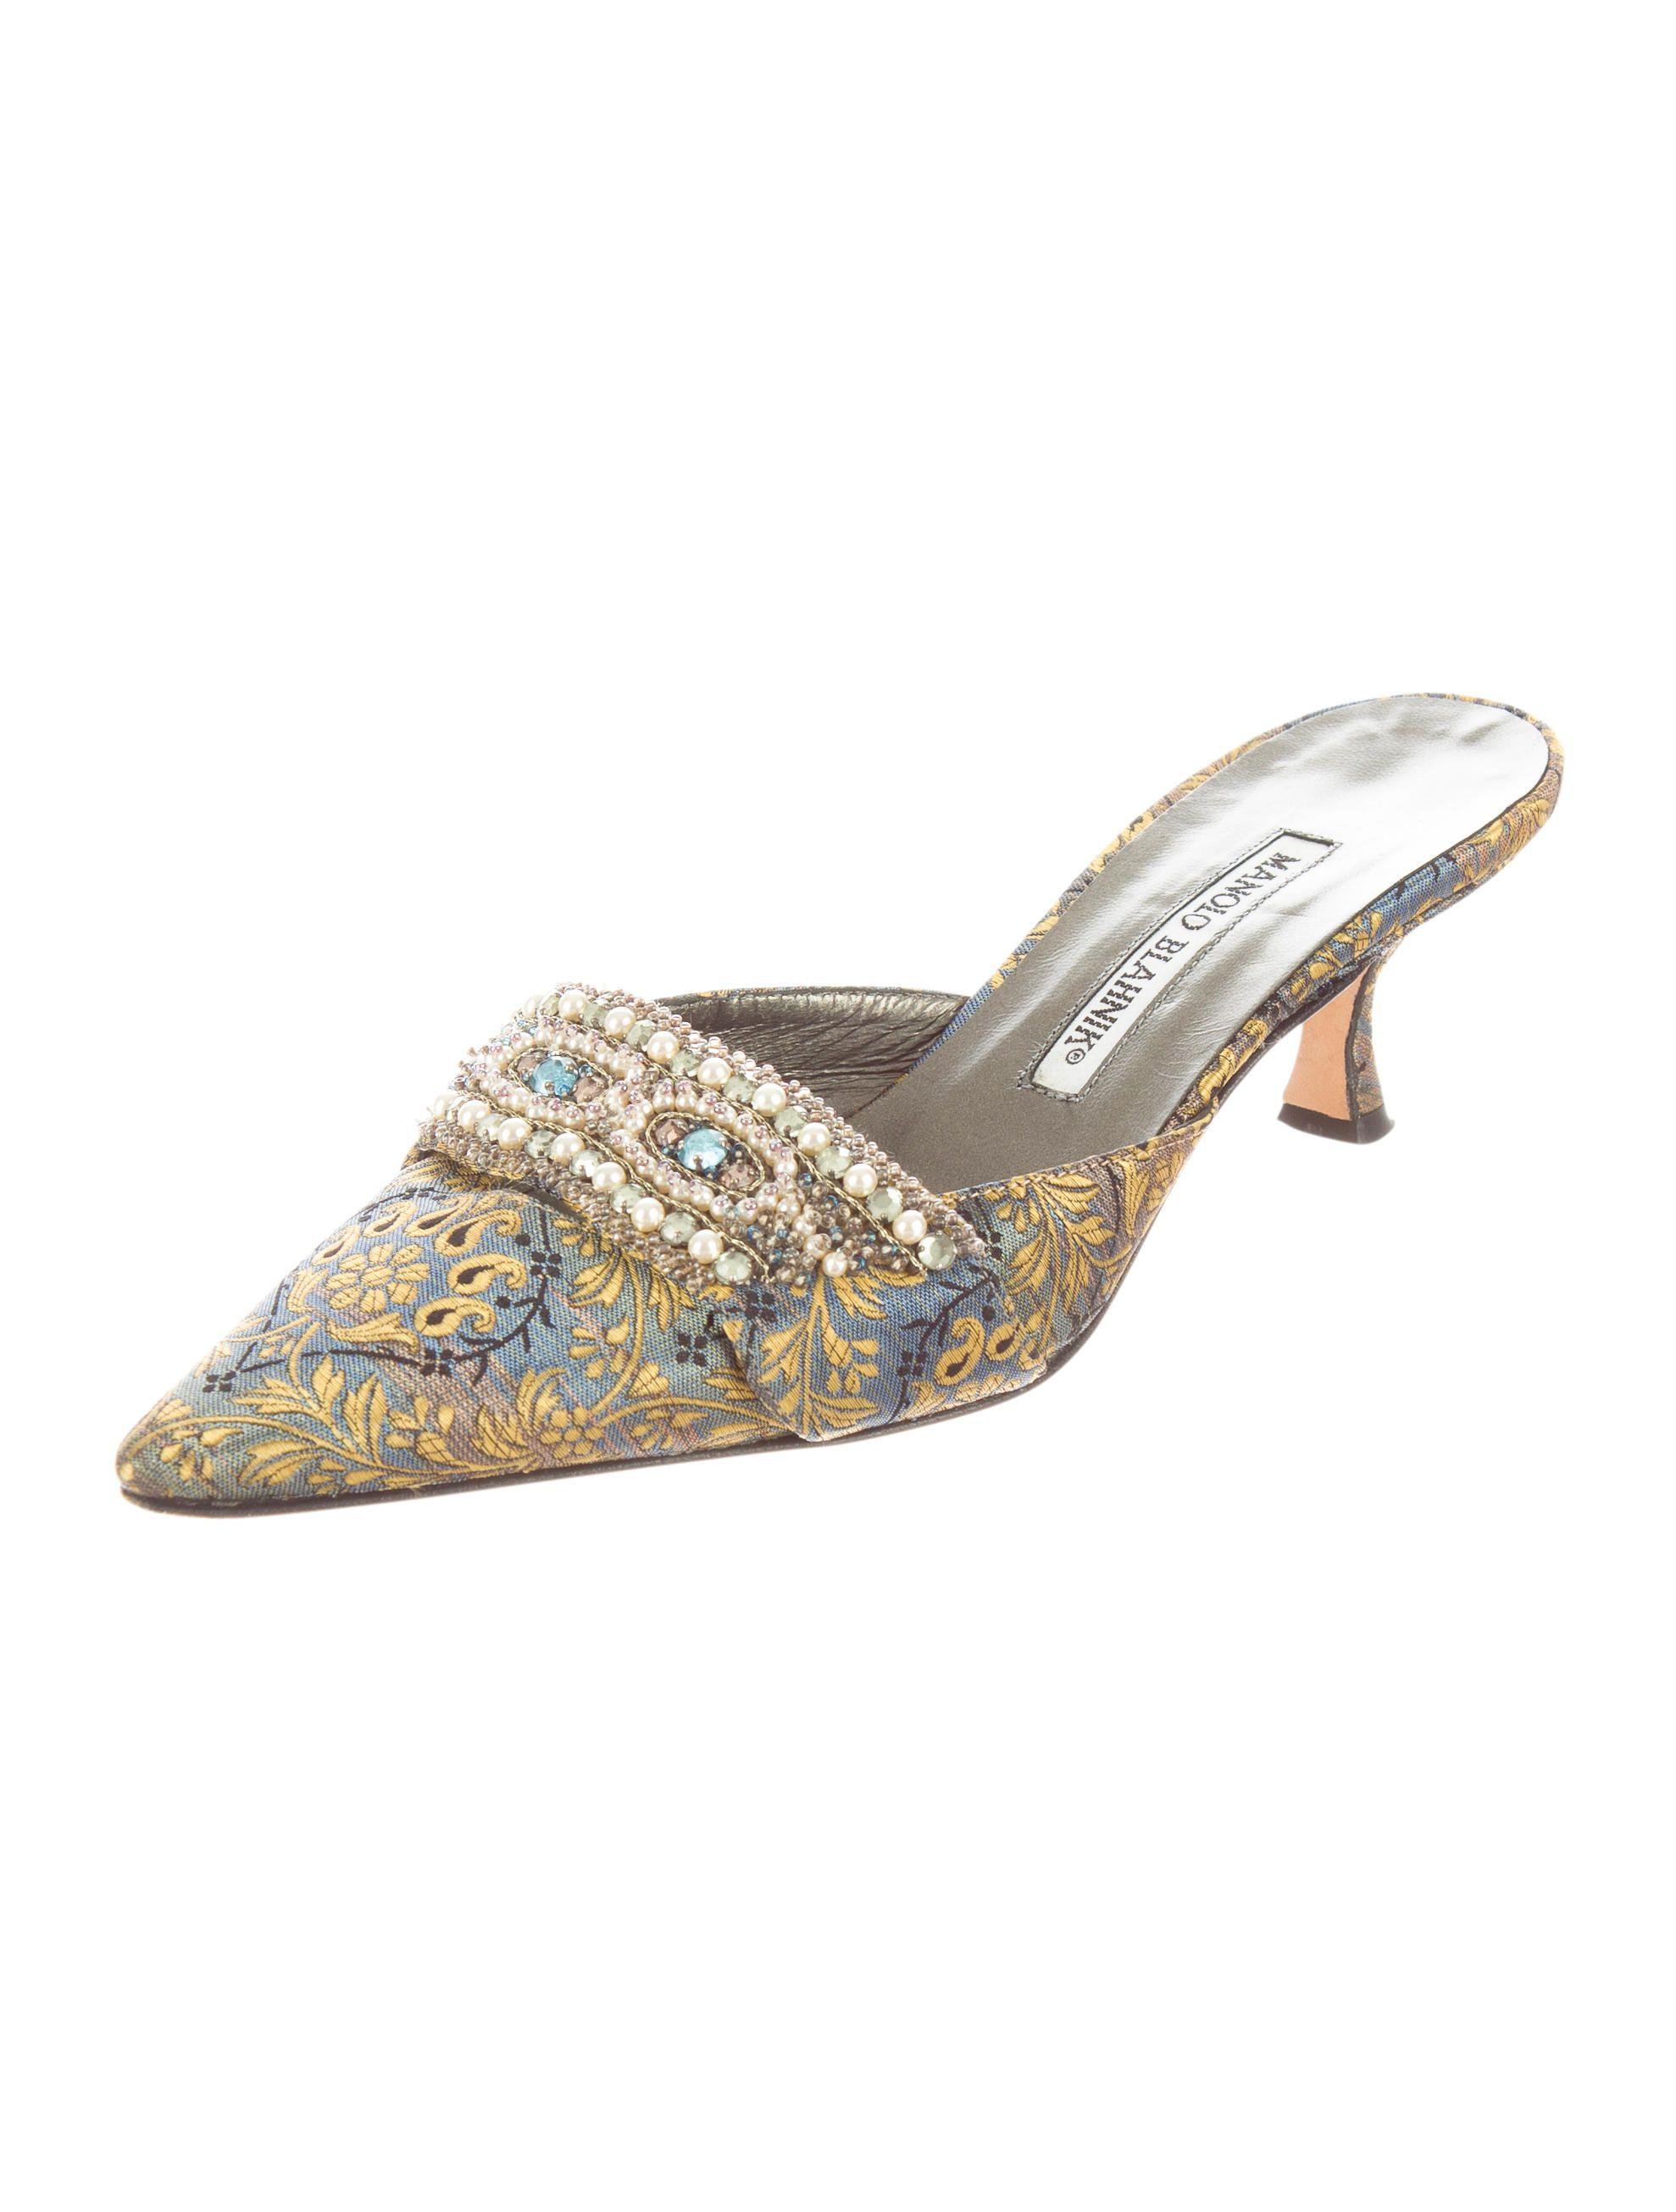 7112bdae8da ... low cost manolo blahnik kitten heel mules manolo blahnik heels sensible  shoes prada shoes heeled 0c096